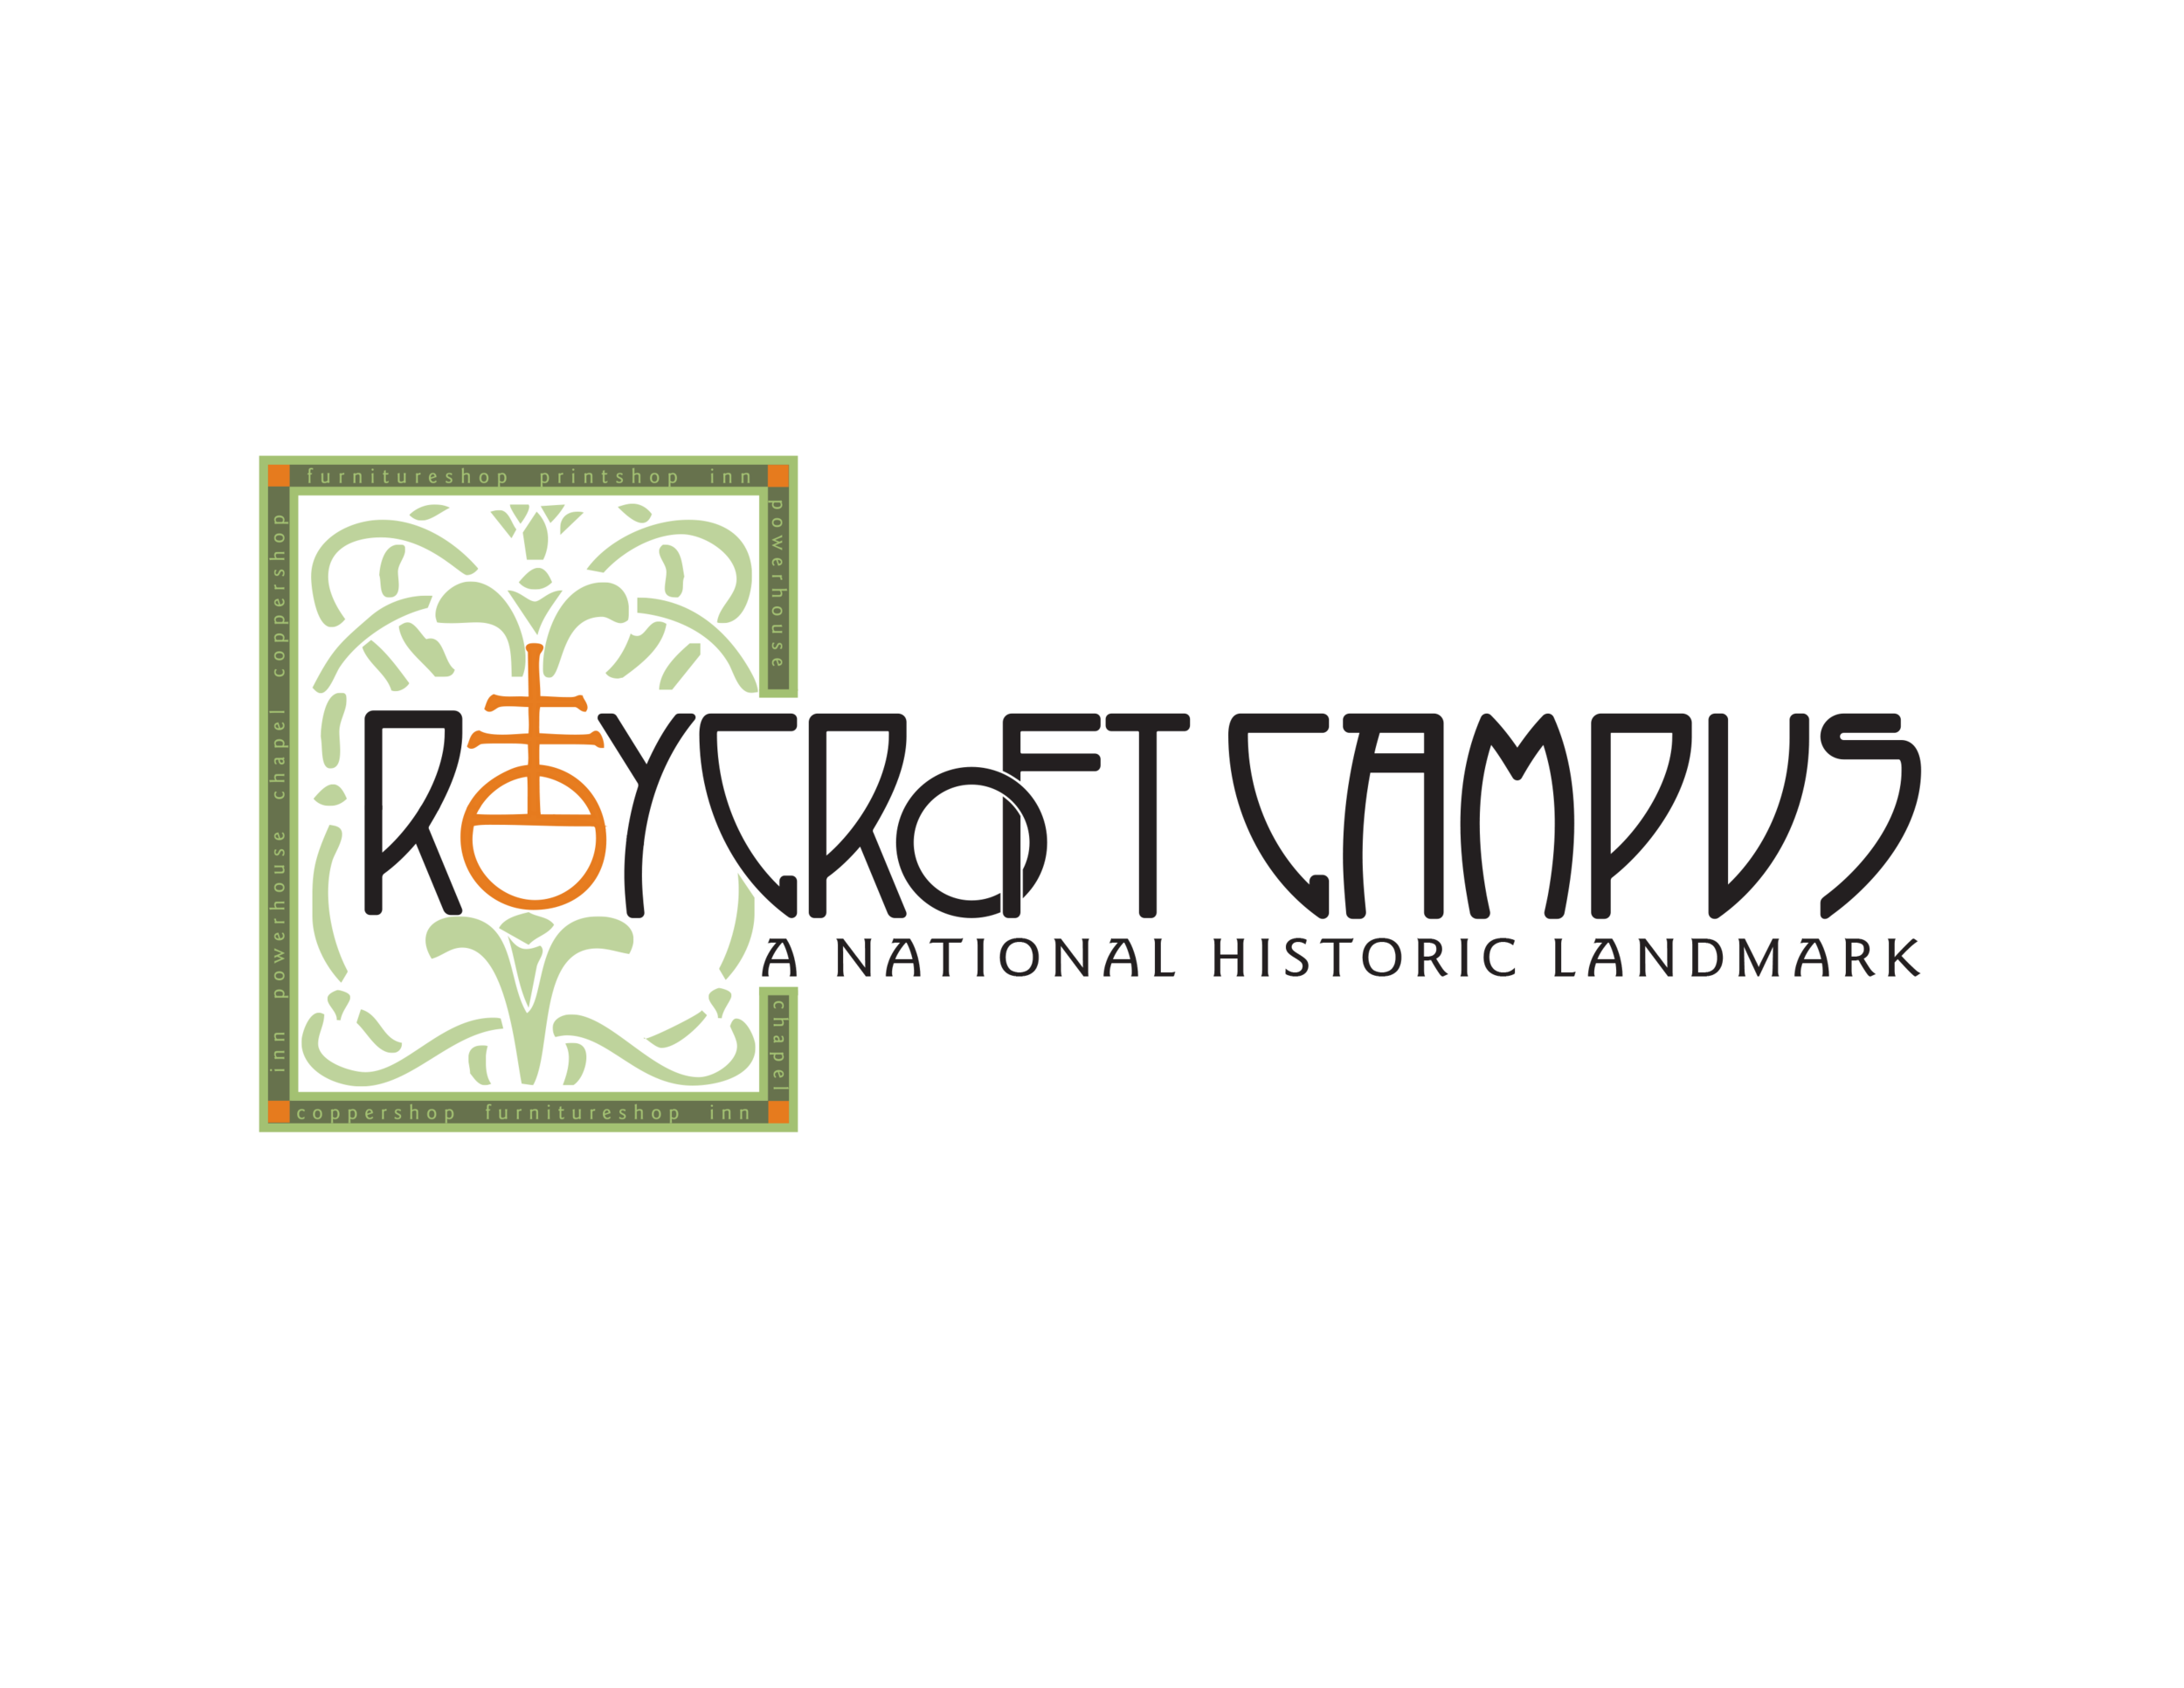 RoycroftCampusNHLBlack.png